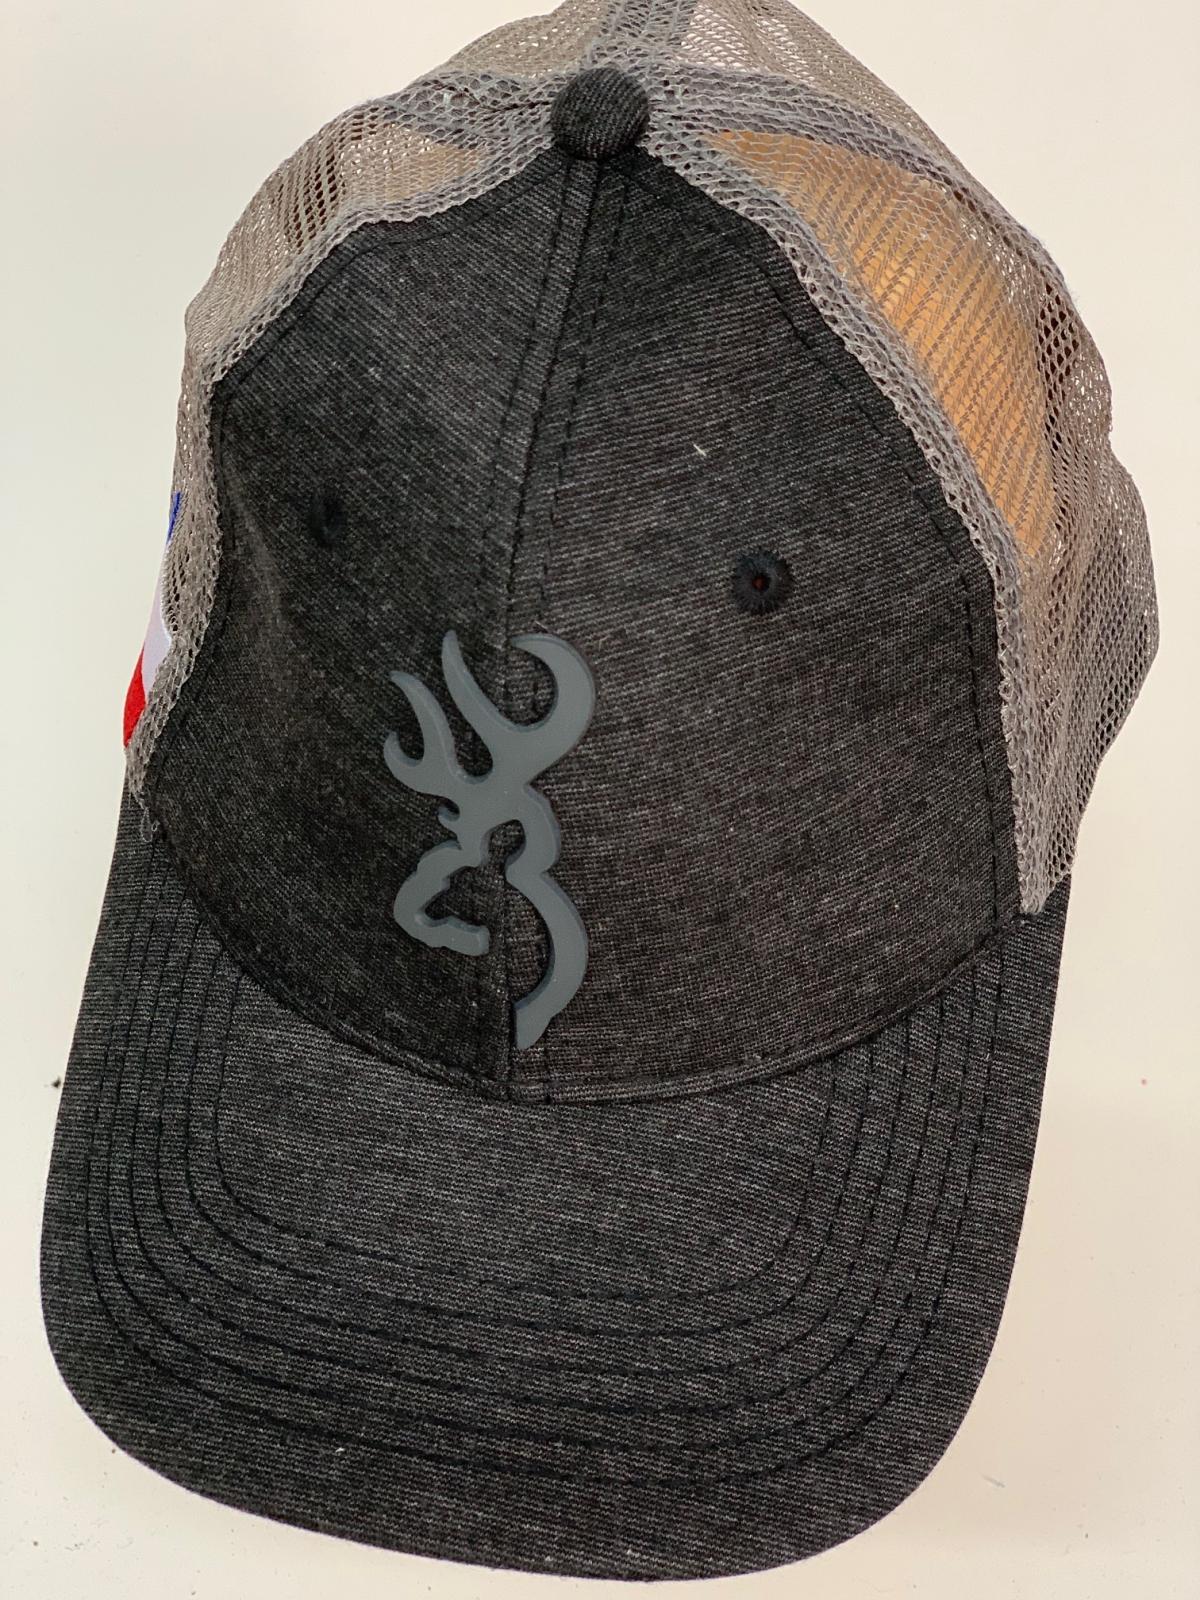 Бейсболка Browning серый трикотаж с сеткой